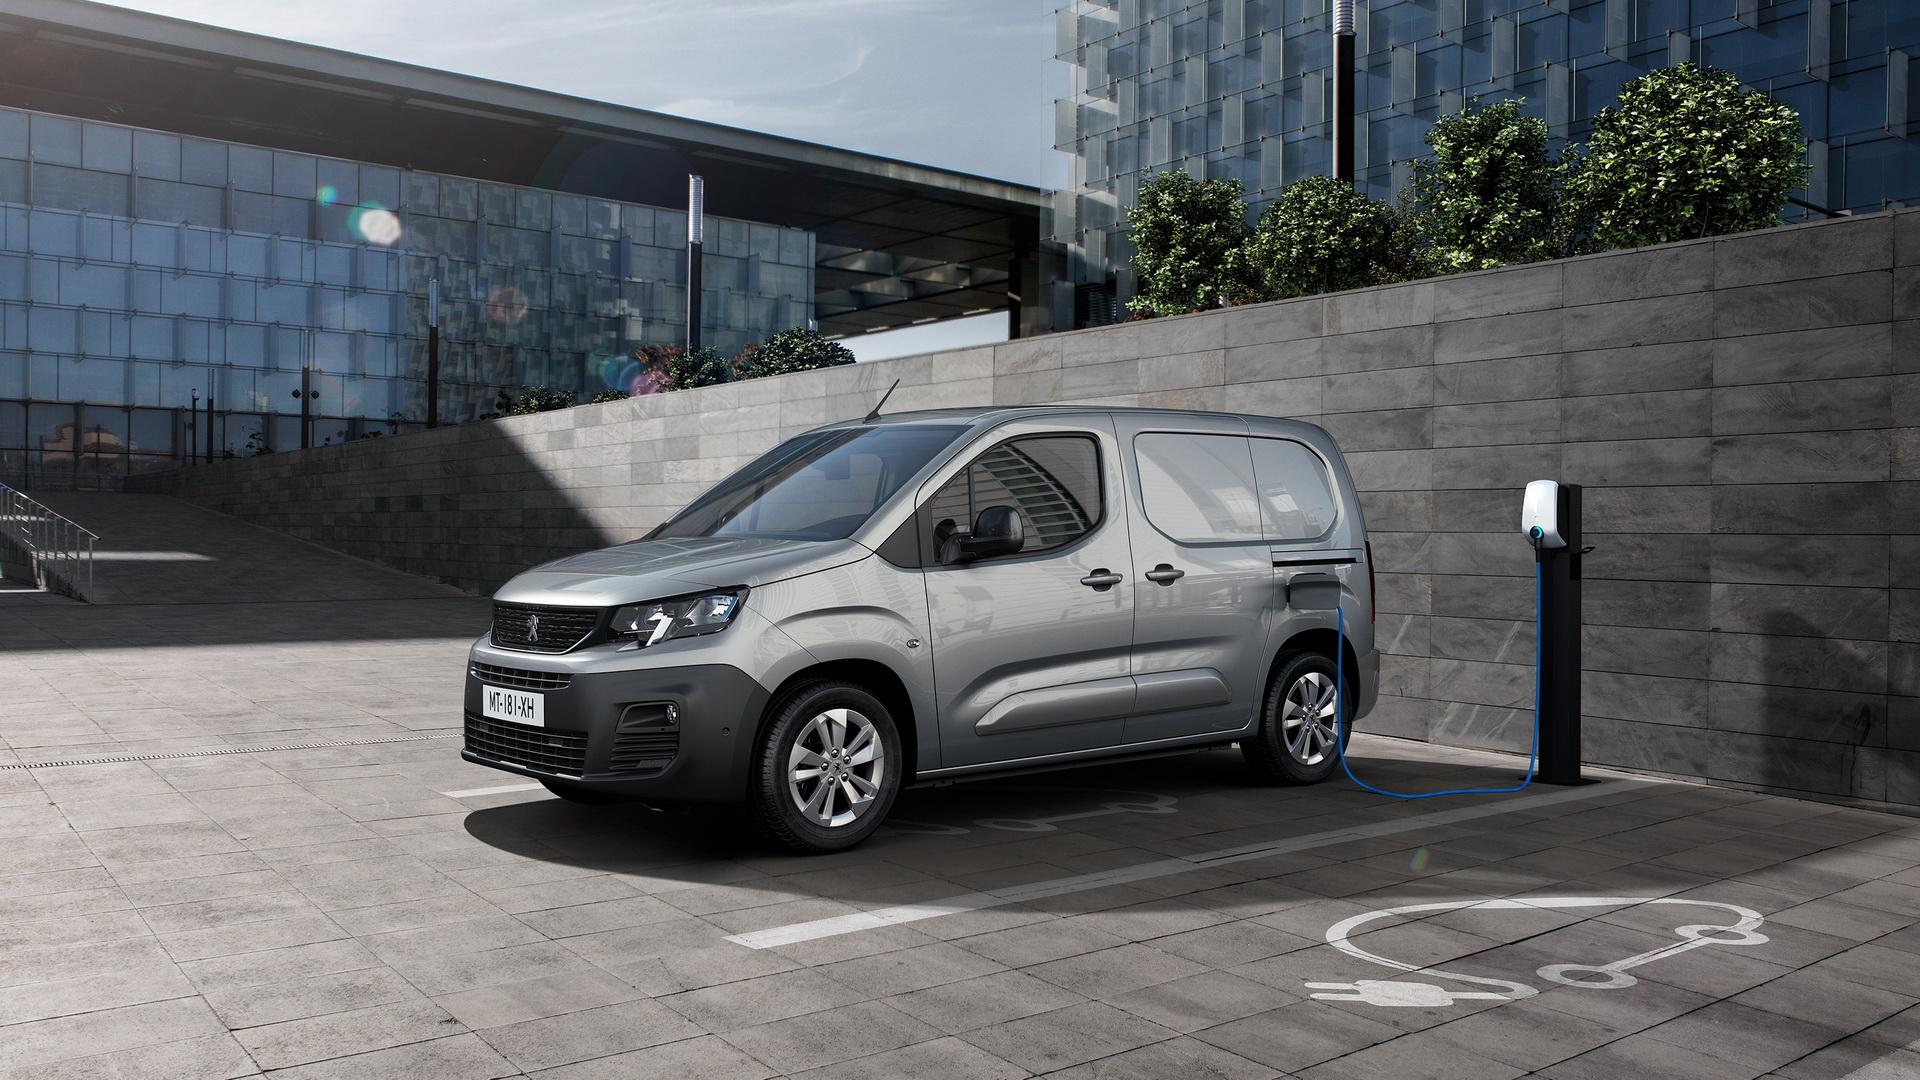 Peugeot e-Partner: Έγινε ηλεκτρικό και το μίνιβαν των Γάλλων [pics]